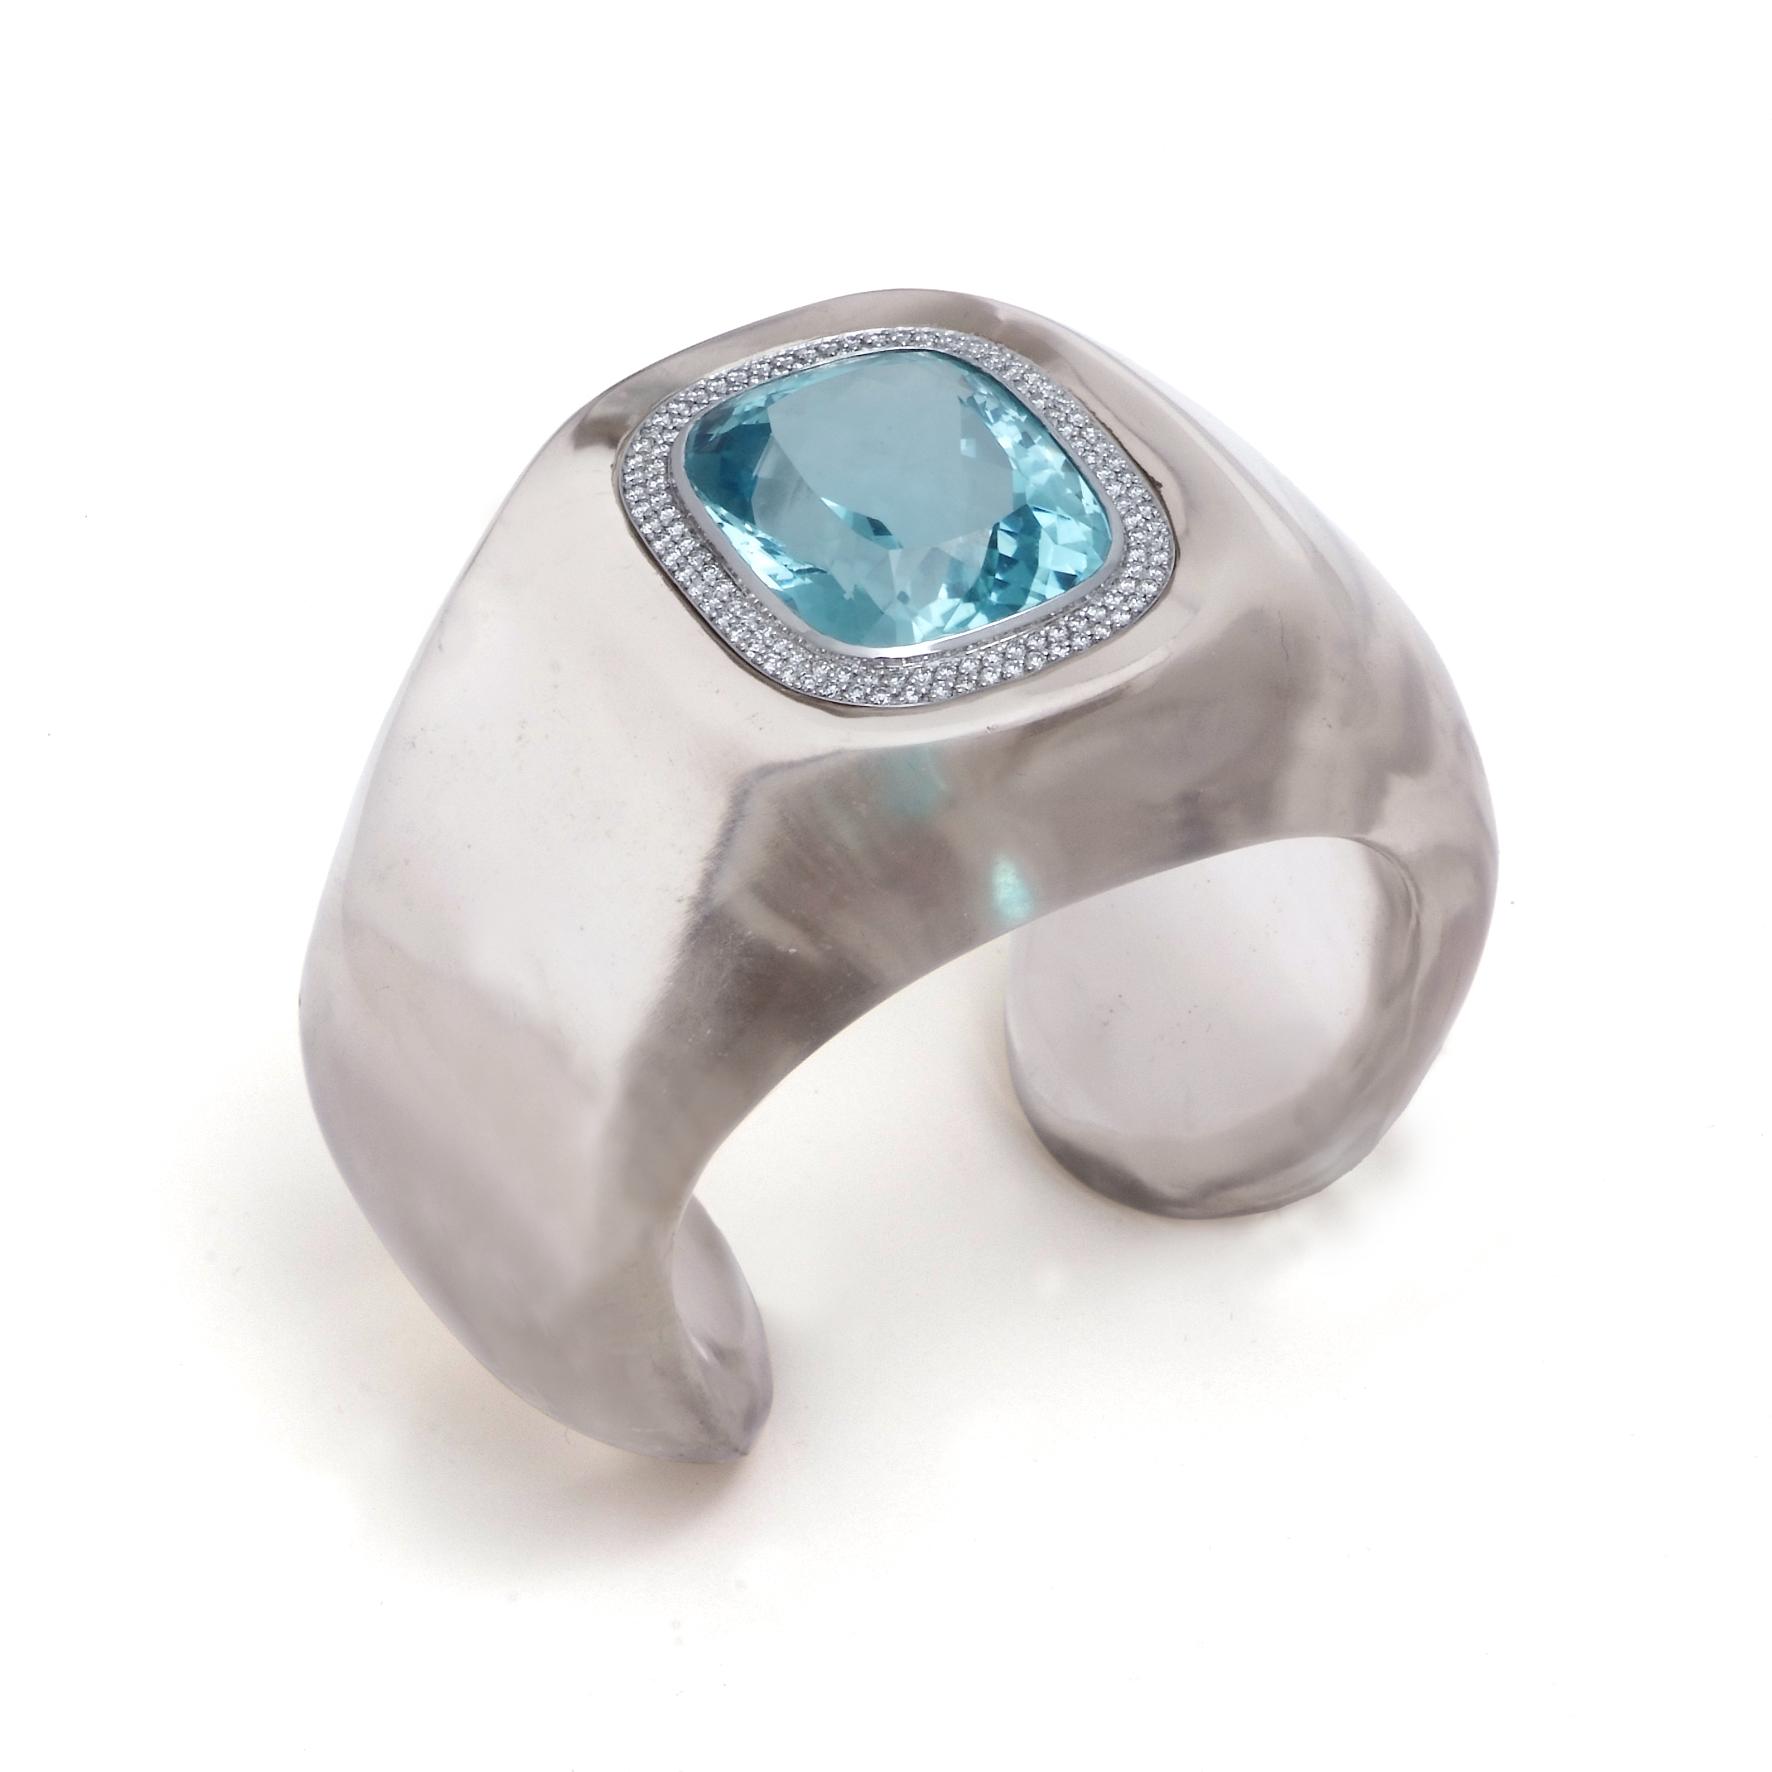 Rock-crystal-and-aquamarine-cuff-bangle-1.jpg